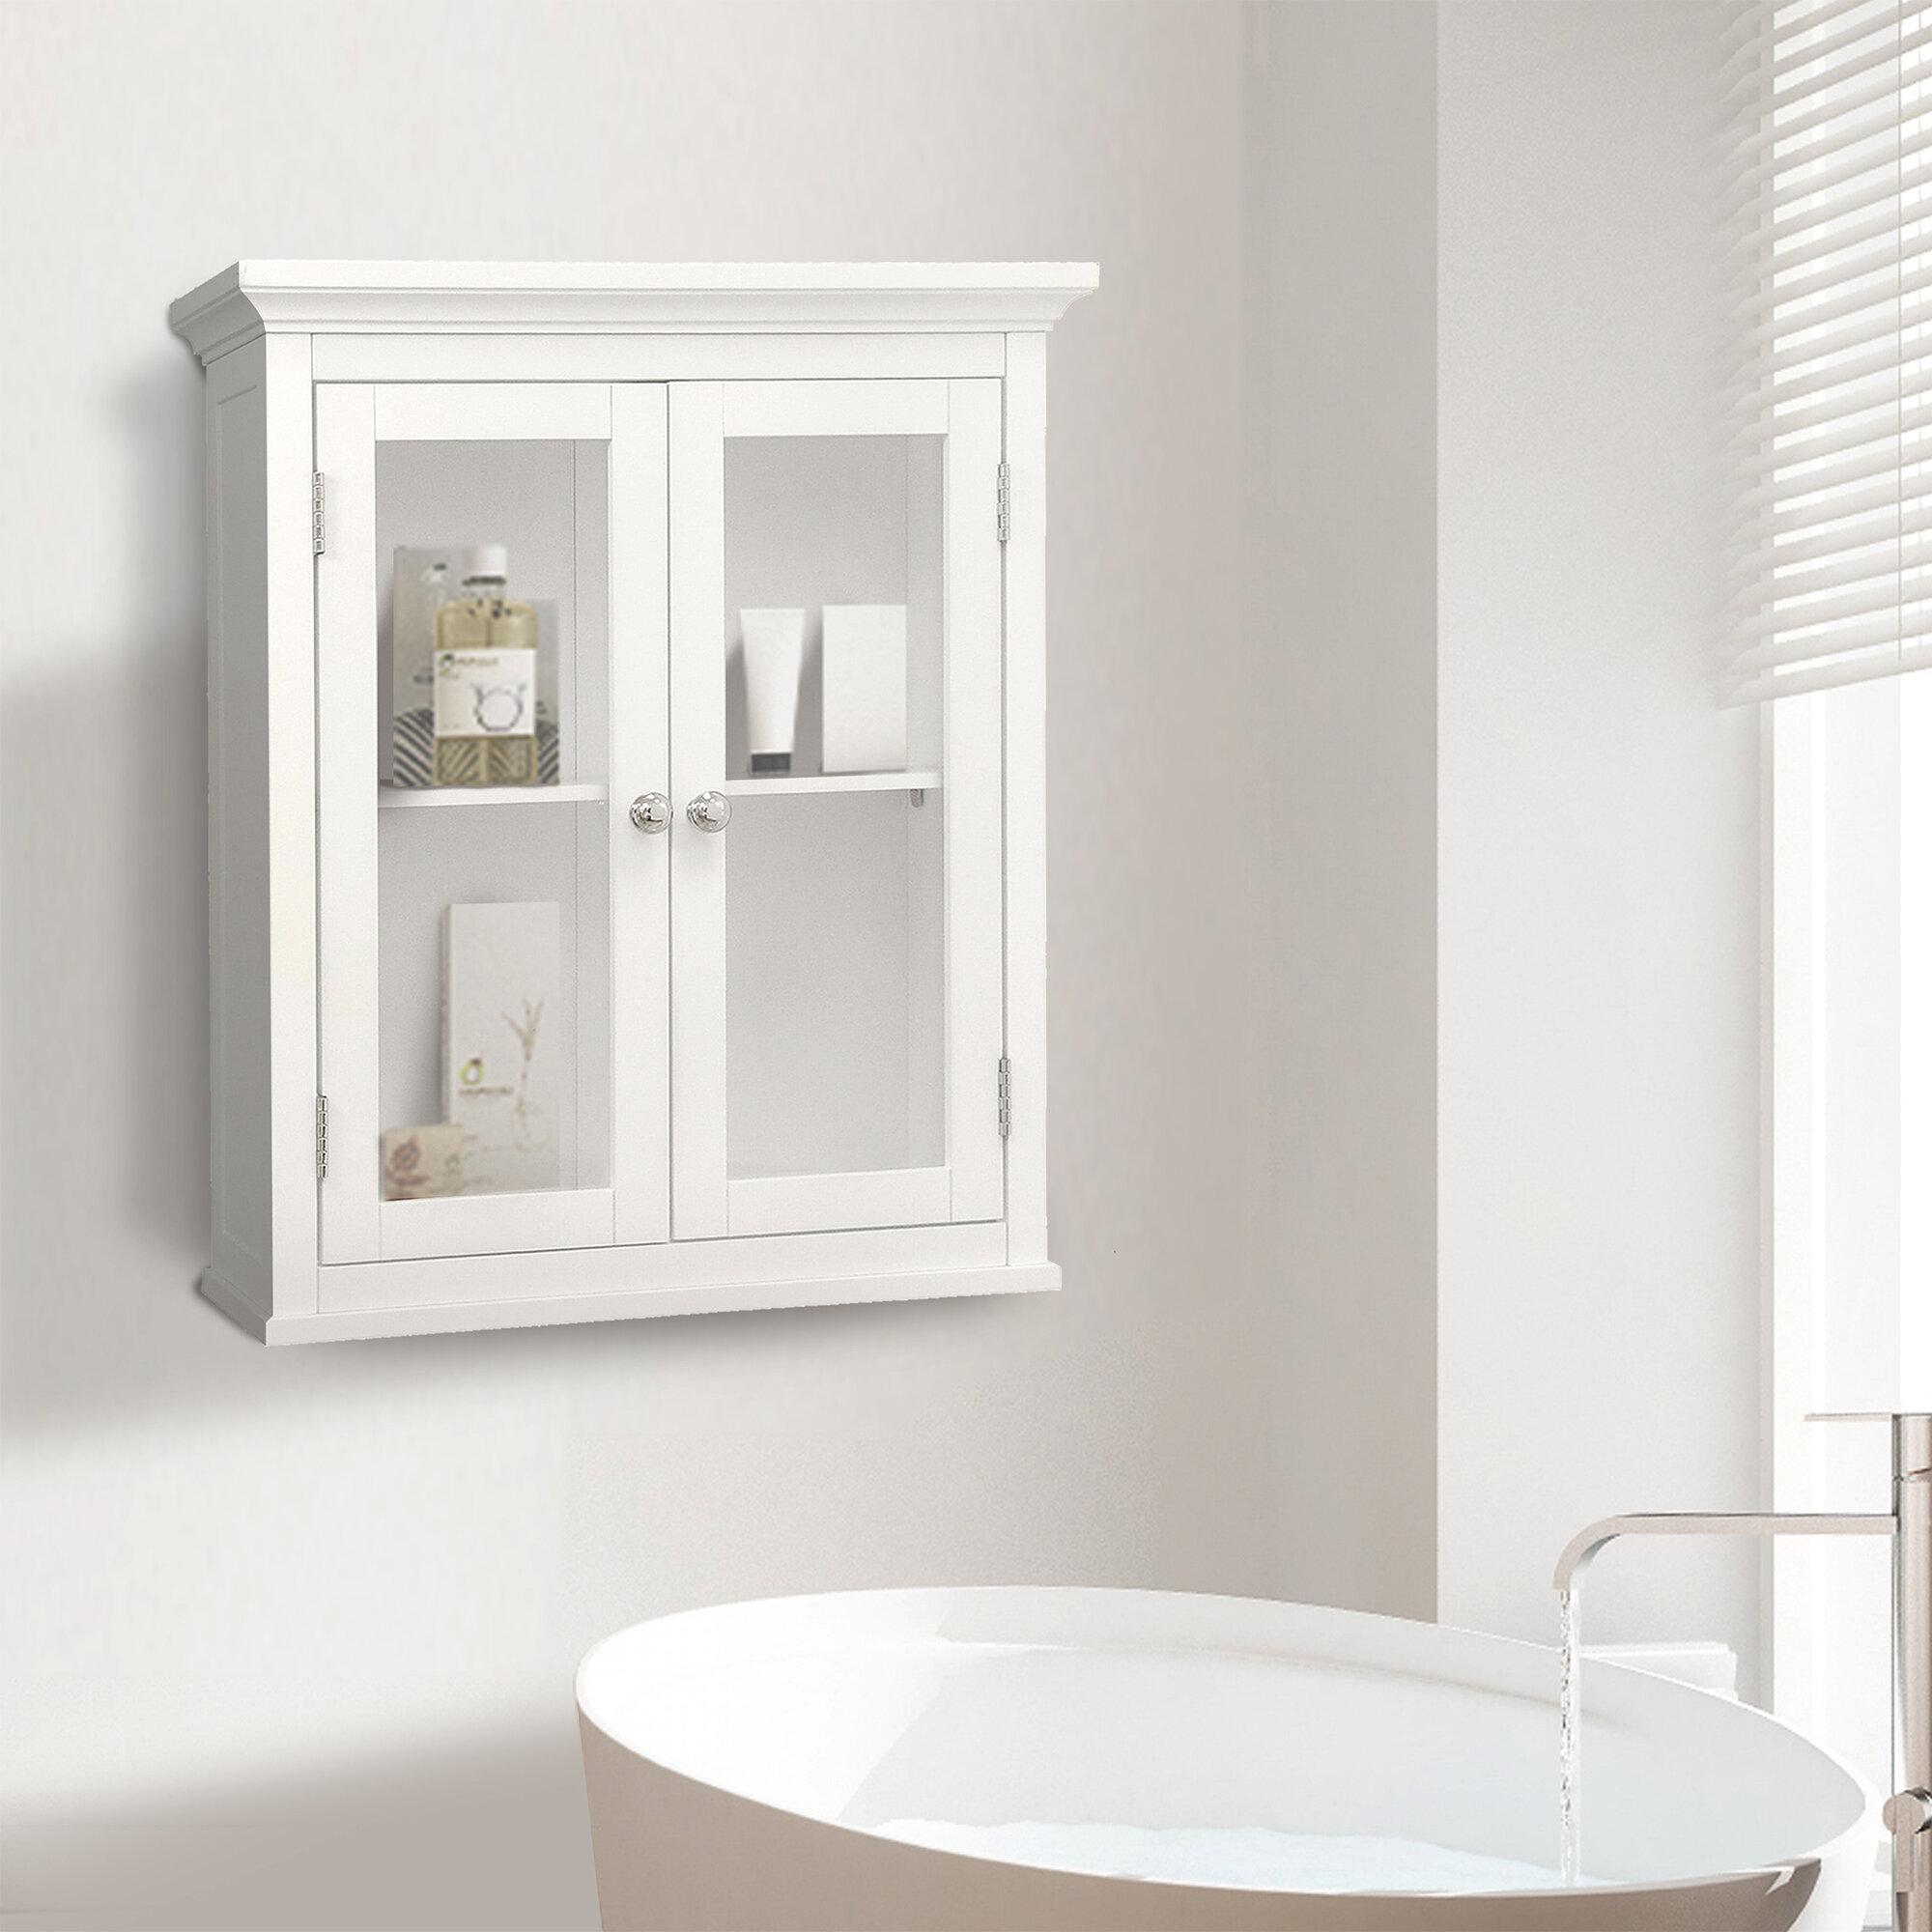 Beachcrest Home Sumter 20 W X 24 H X 7 D Wall Mounted Bathroom Cabinet Reviews Wayfair